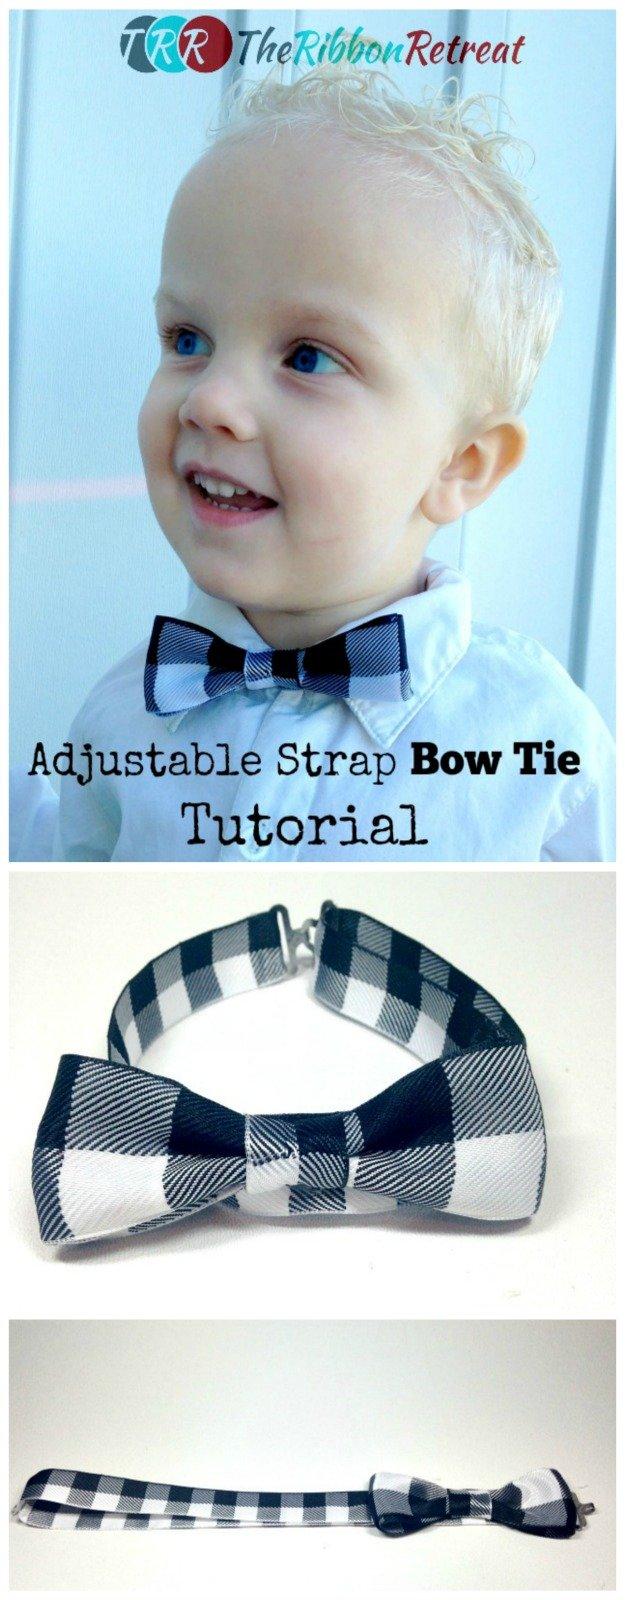 Adjustable Strap Bow Tie Tutorial The Ribbon Retreat Blog Howtotiethebowtieknottyinginstructionspng